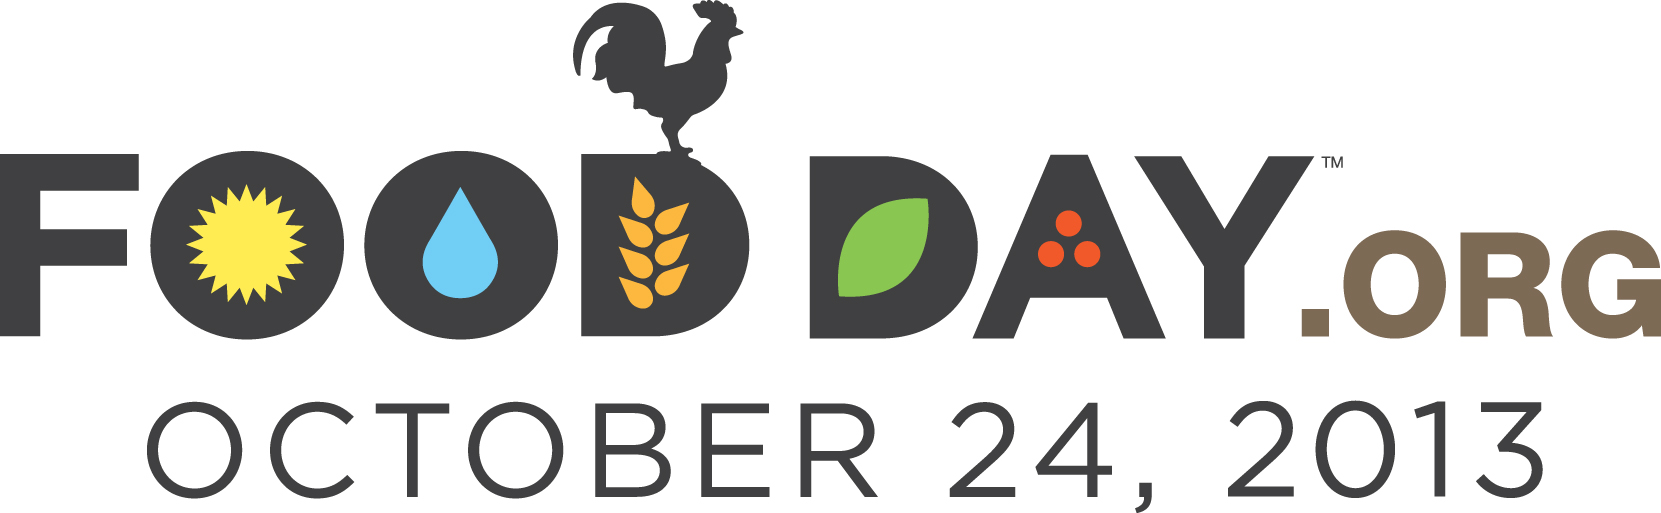 FoodDay.org_linearLogo_2013.jpg